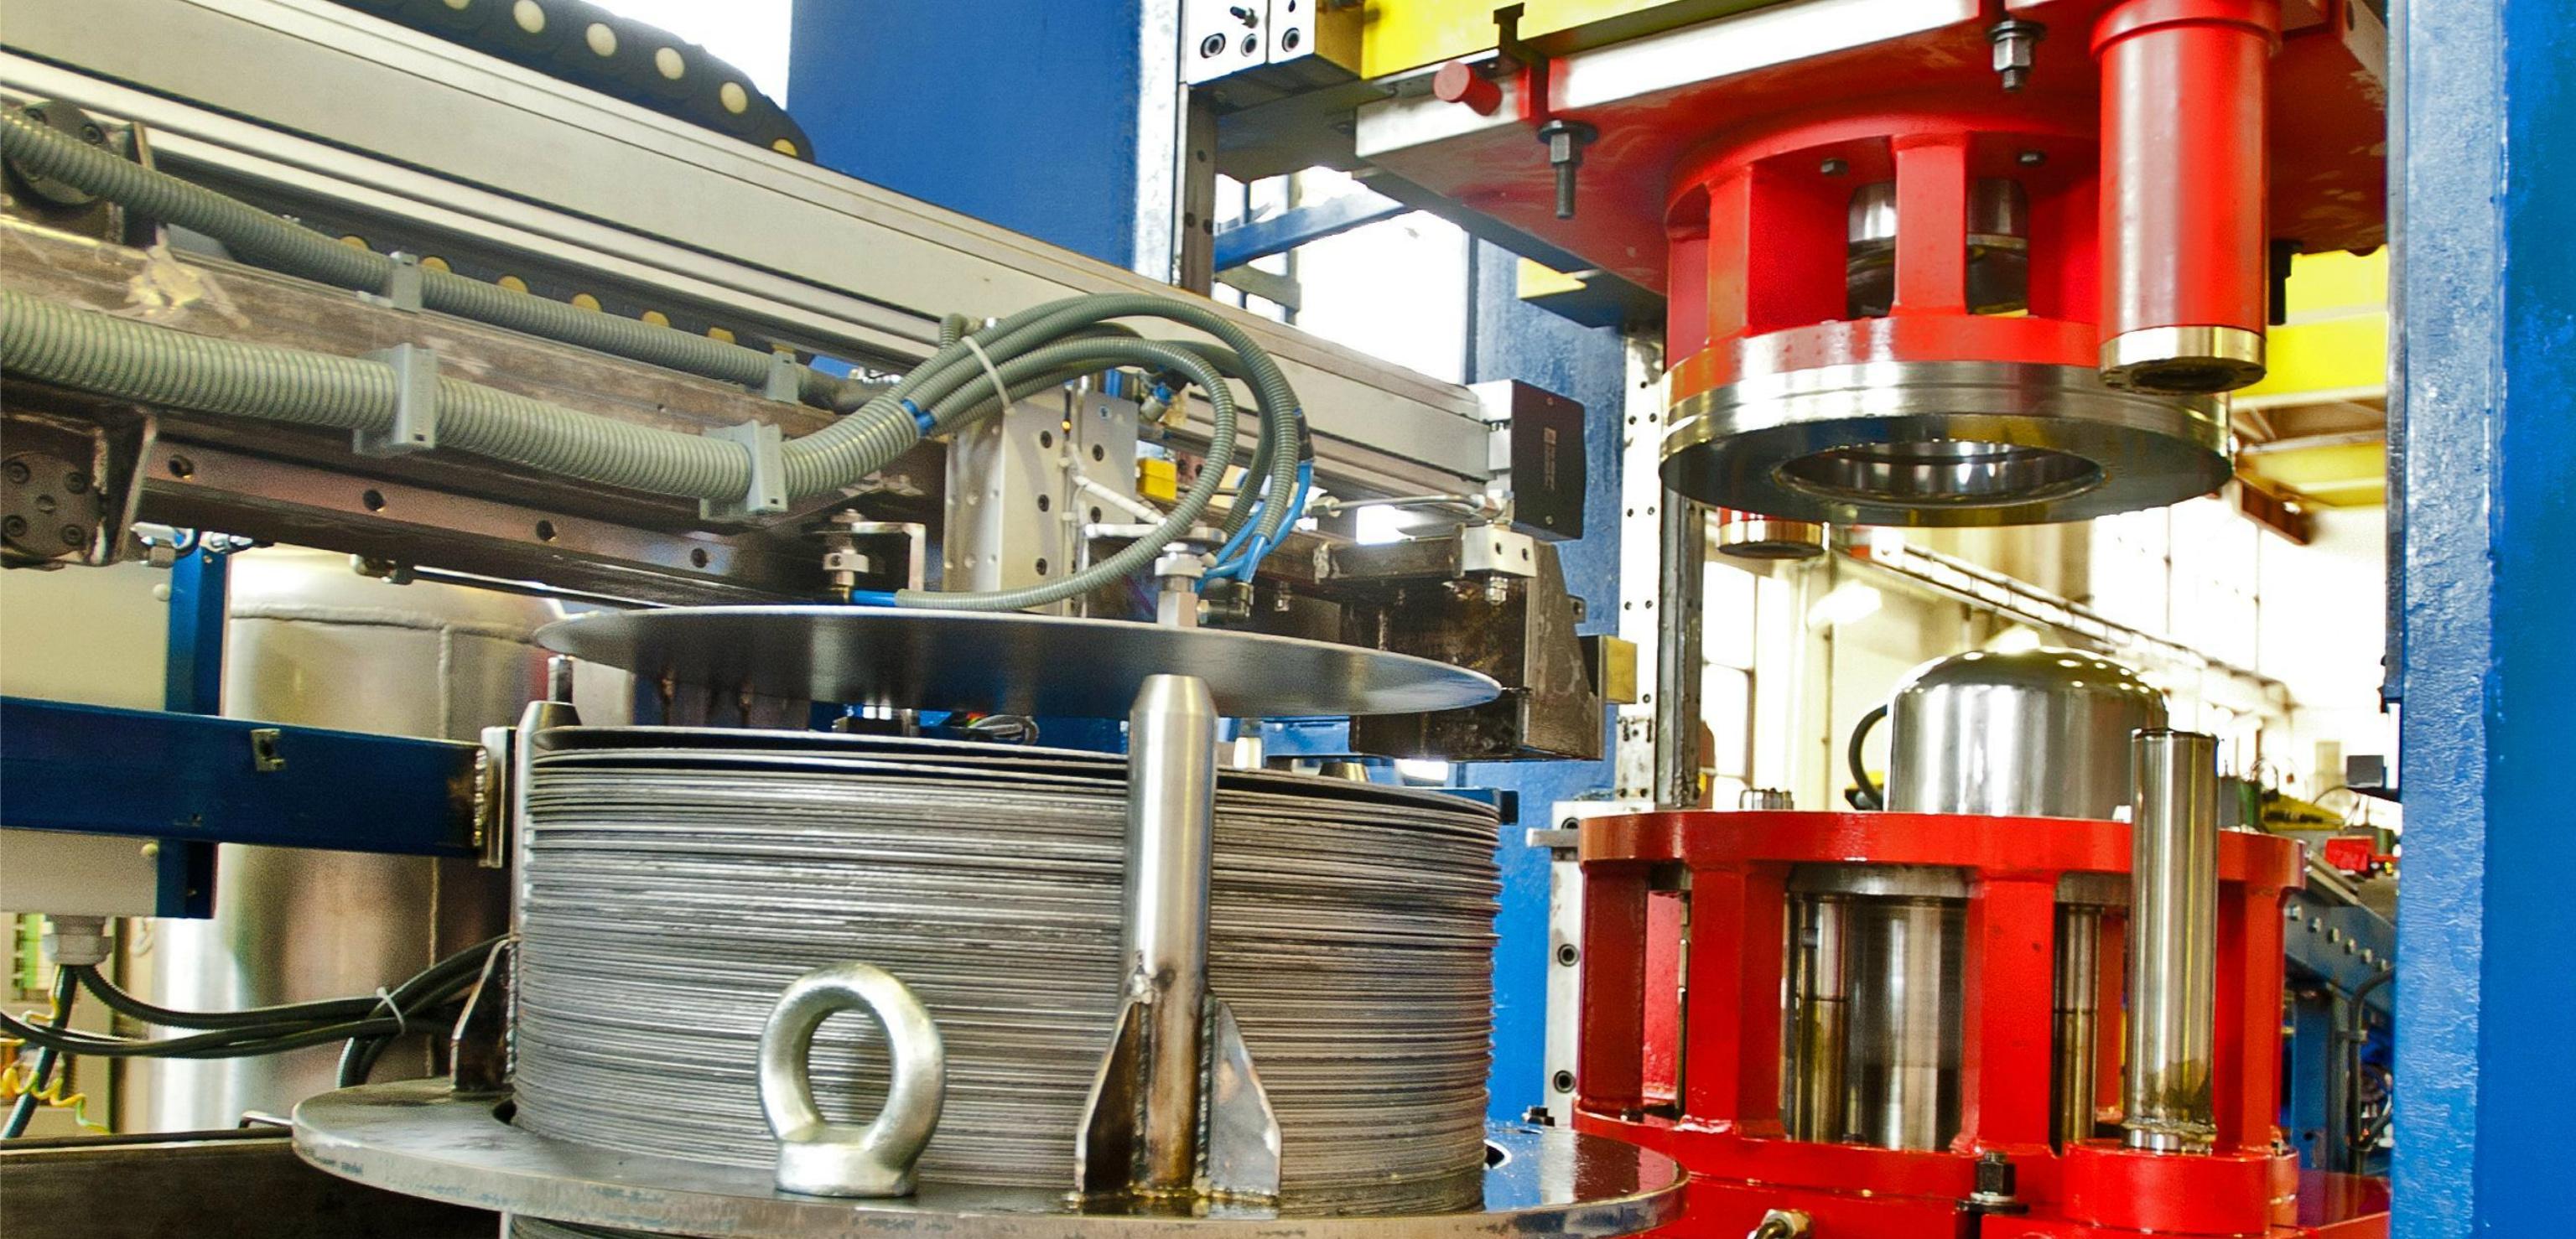 Hydraulic deep drawing press automatic feeding system four column press h type press supplier from turkey